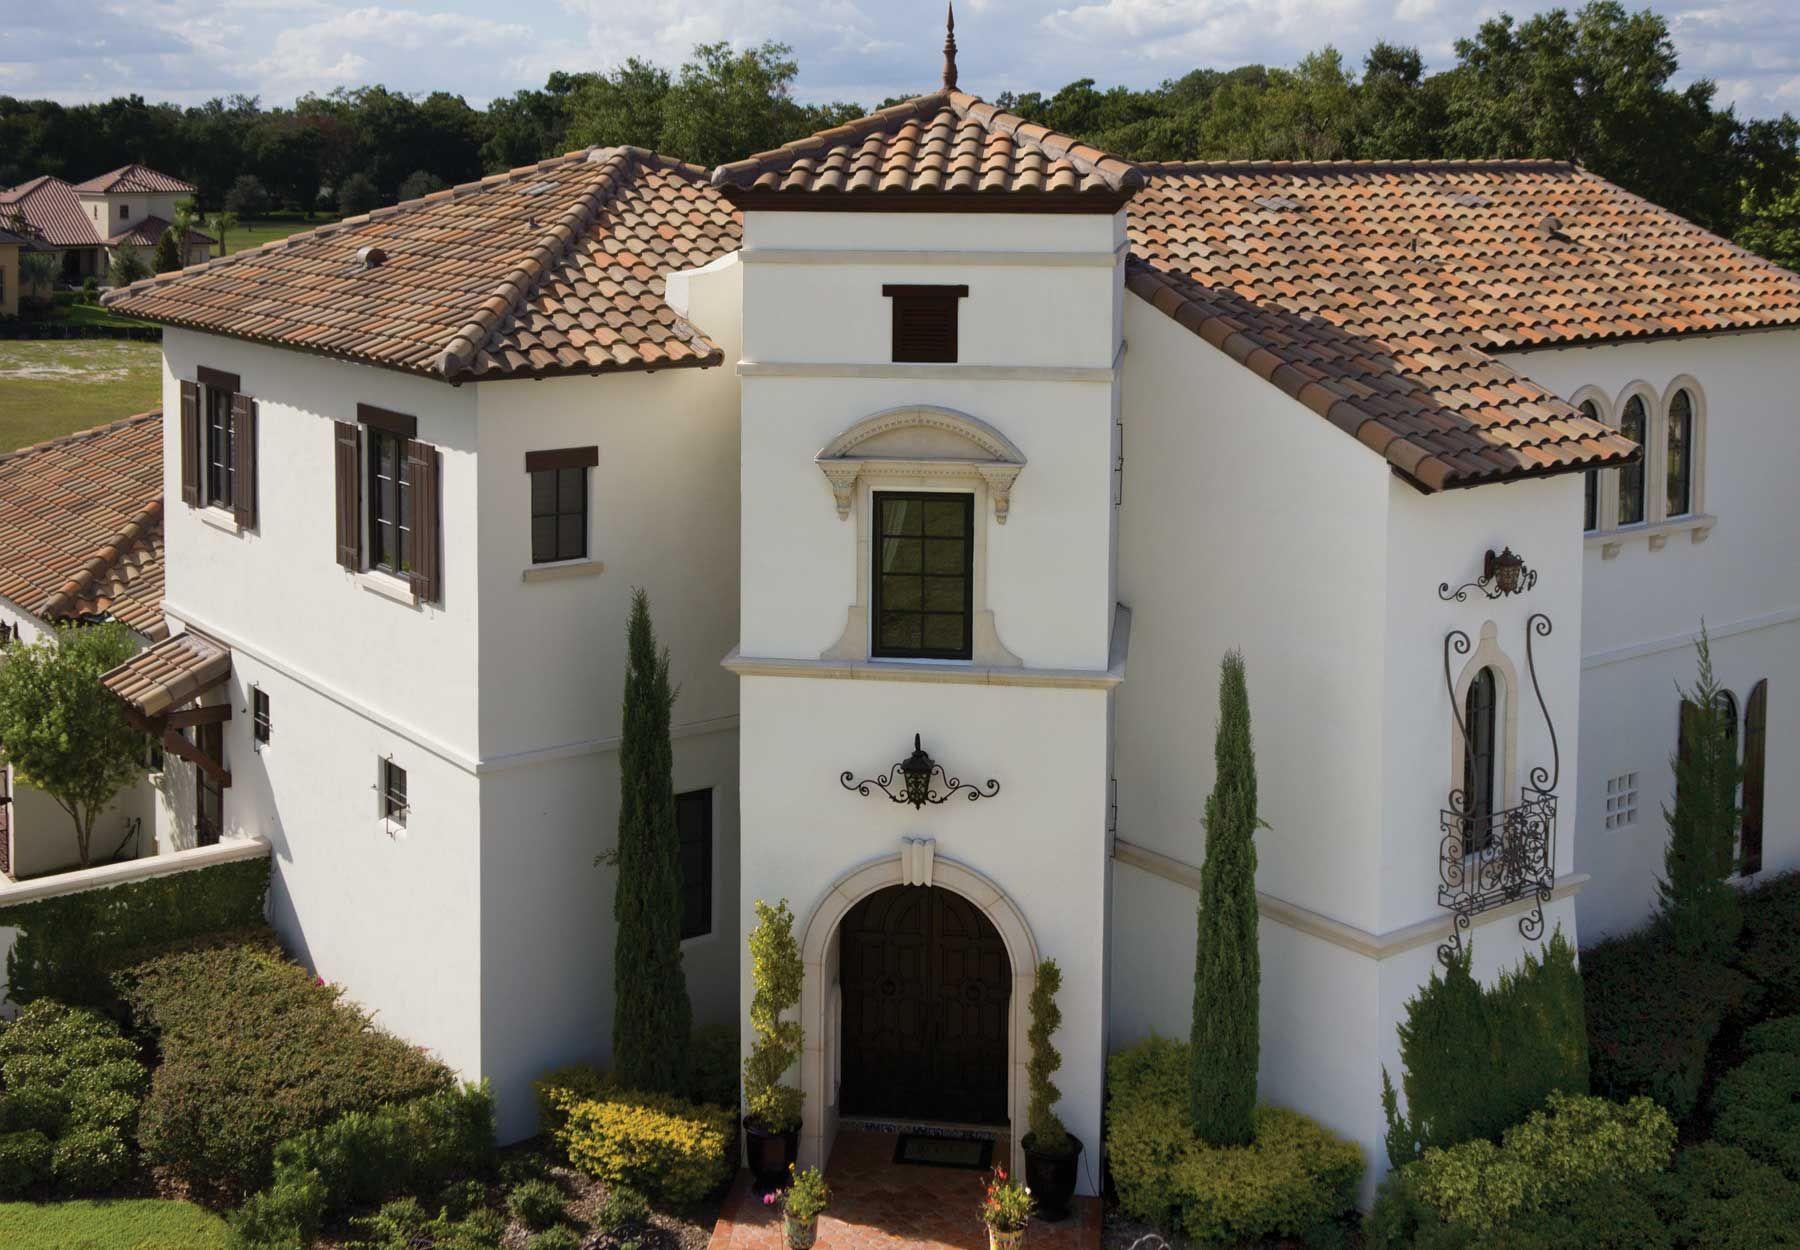 3773 Walnut Creek Blend Roof Colors Concrete Roof Tiles Marble Canyon